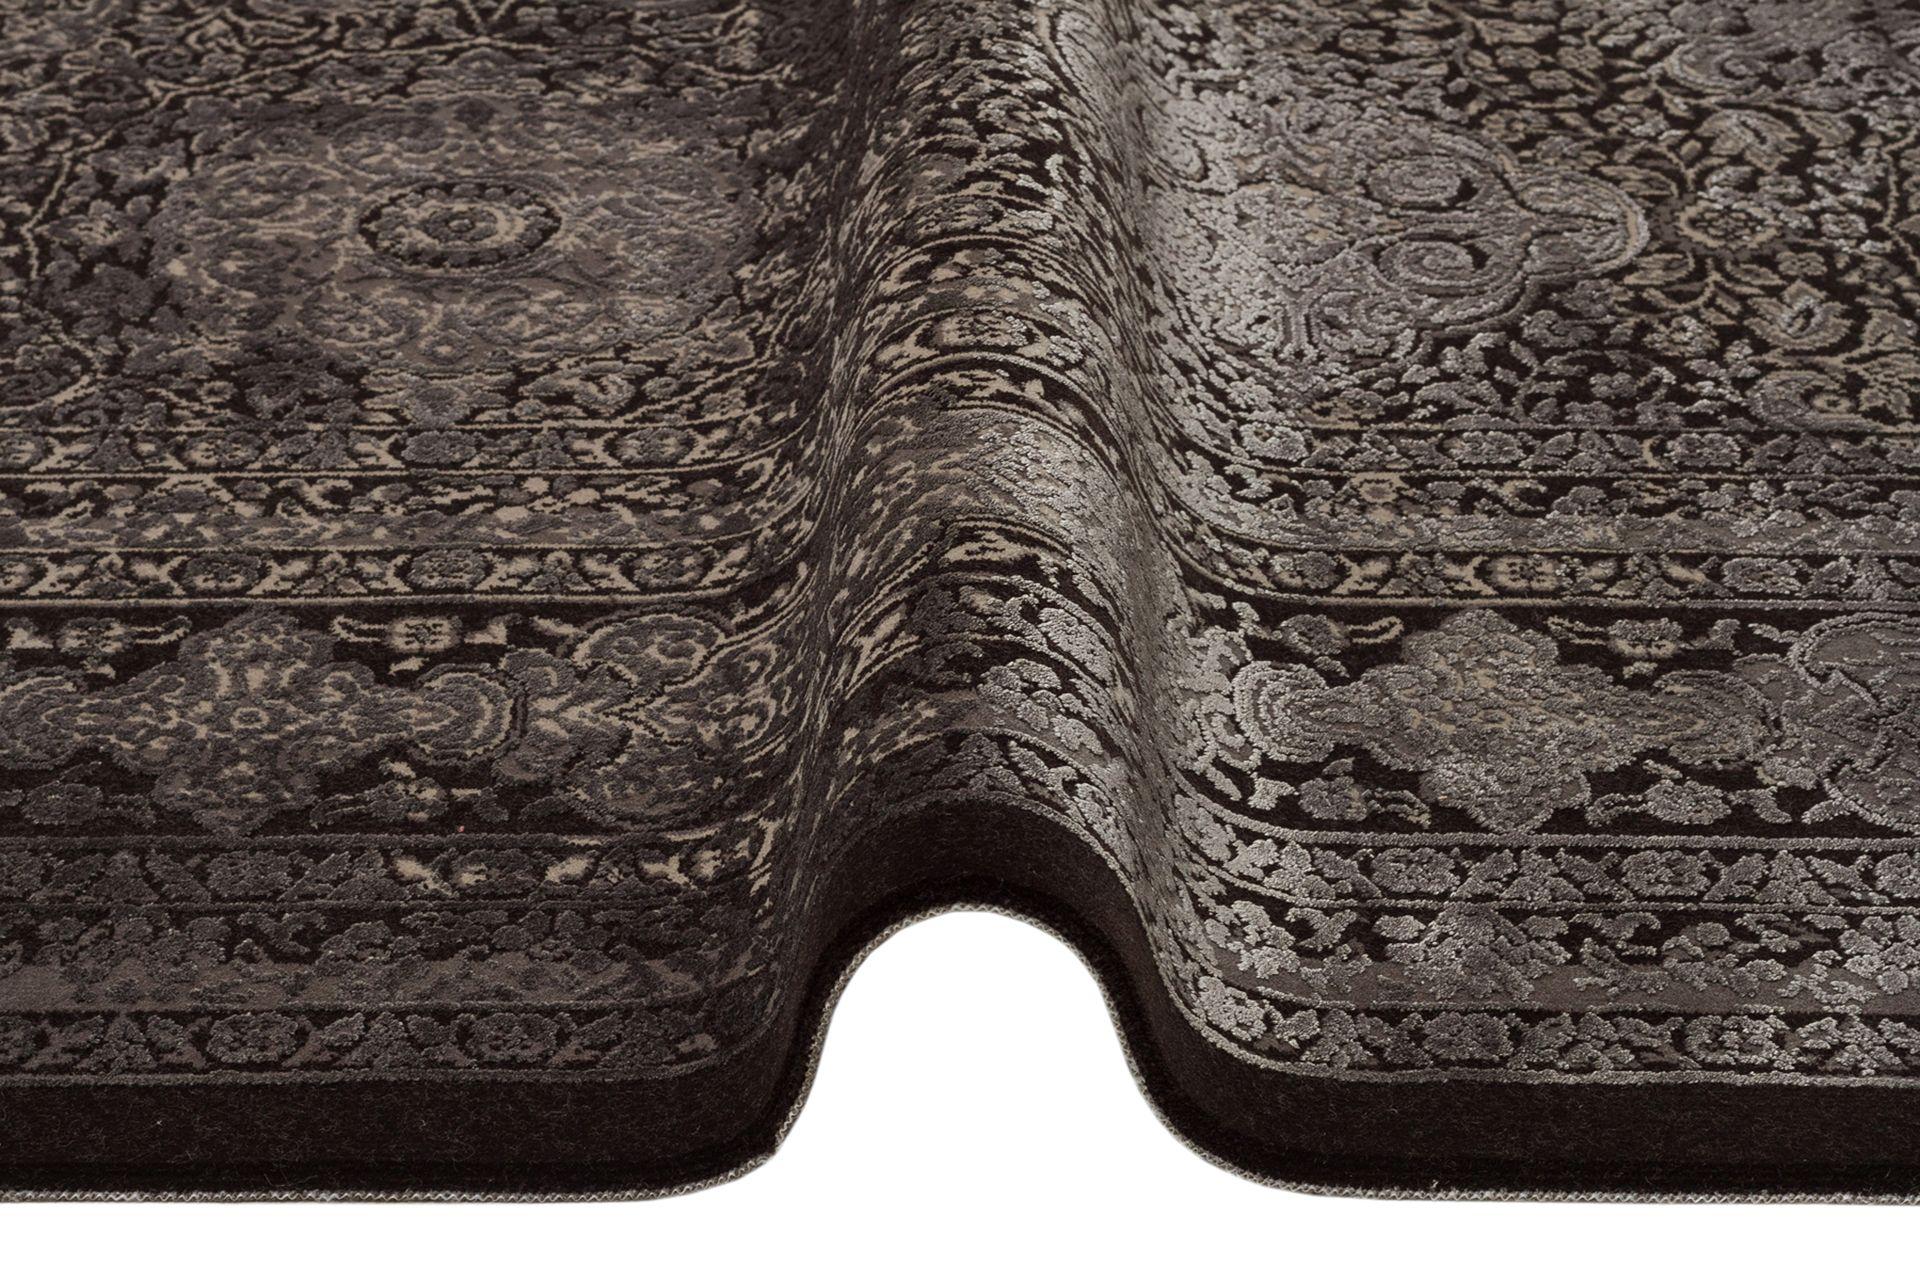 ANADOLU AD 02 ANTRASİT GRİ KLASİK DESENLİ SALON HALISI 240x340